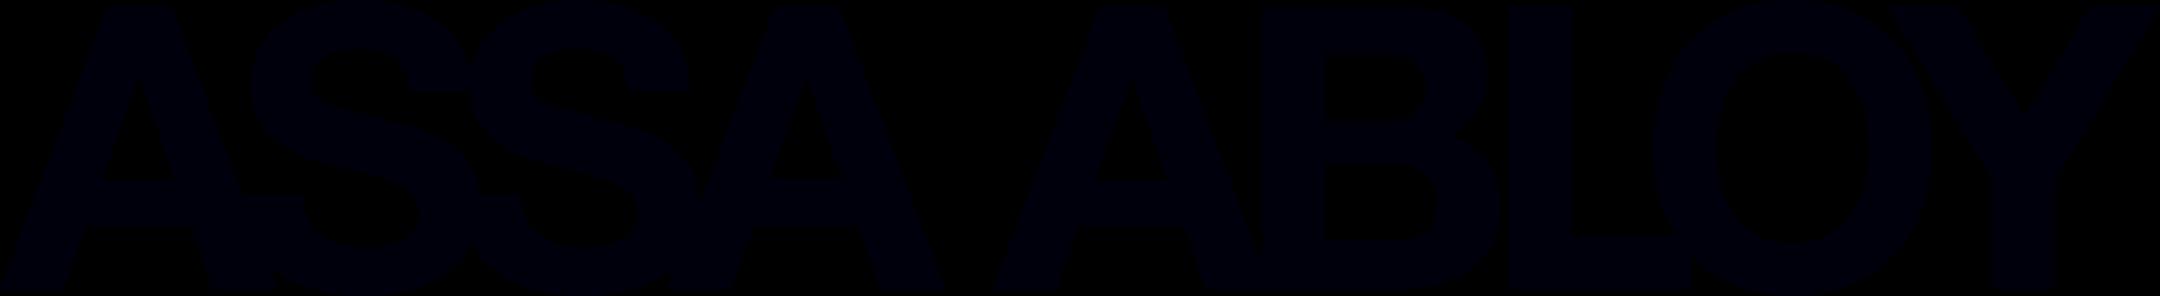 assa abloy logo 1 - ASSA ABLOY Logo